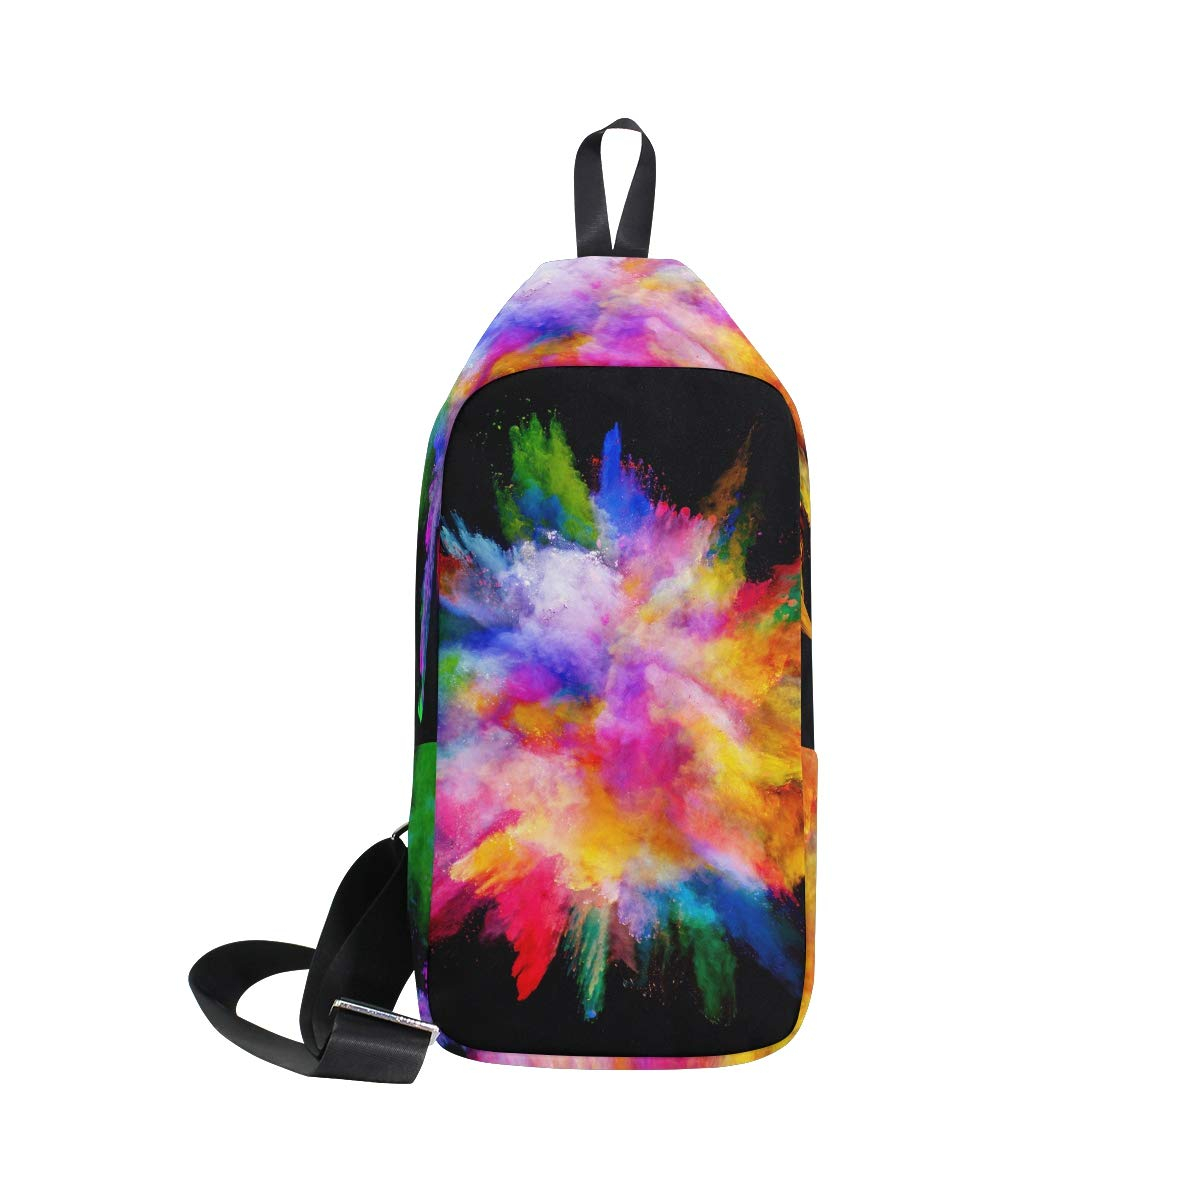 TFONE Colorful Rainbow Tie Dye Crossbody Bag Lightweight Chest Shoulder Messenger Pack Backpack Sling Bag